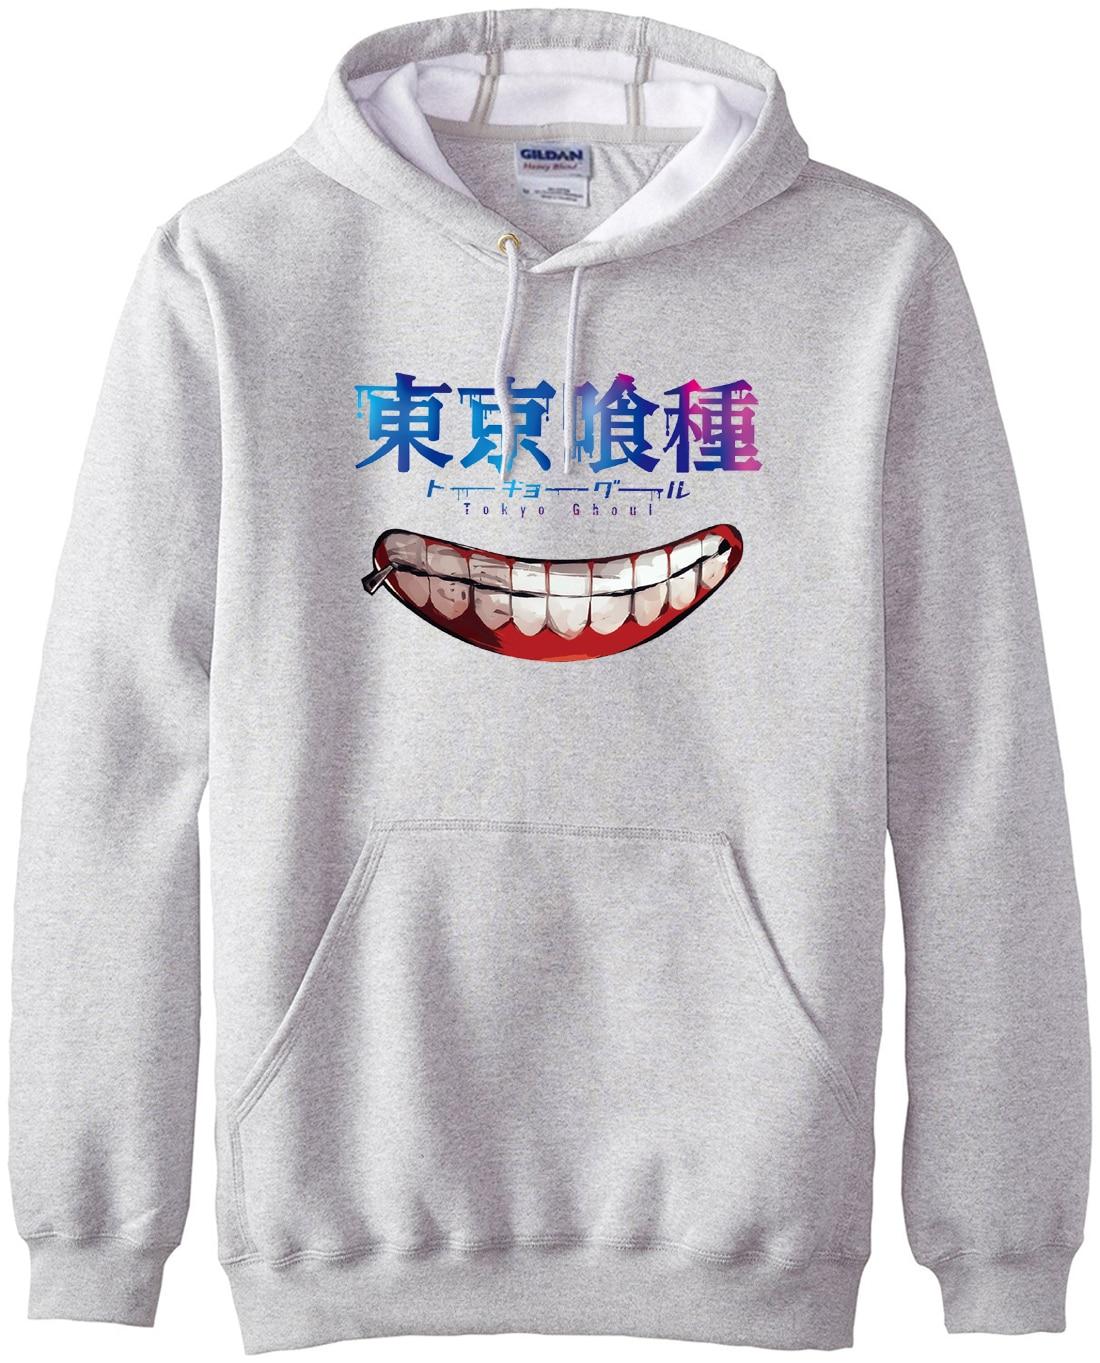 hot sale Tokyo Ghoul Men Hoodies Anime Ken Kaneki Sweatshirts 2017 spring winter new hooded sportswear hip hop sudadera hombre